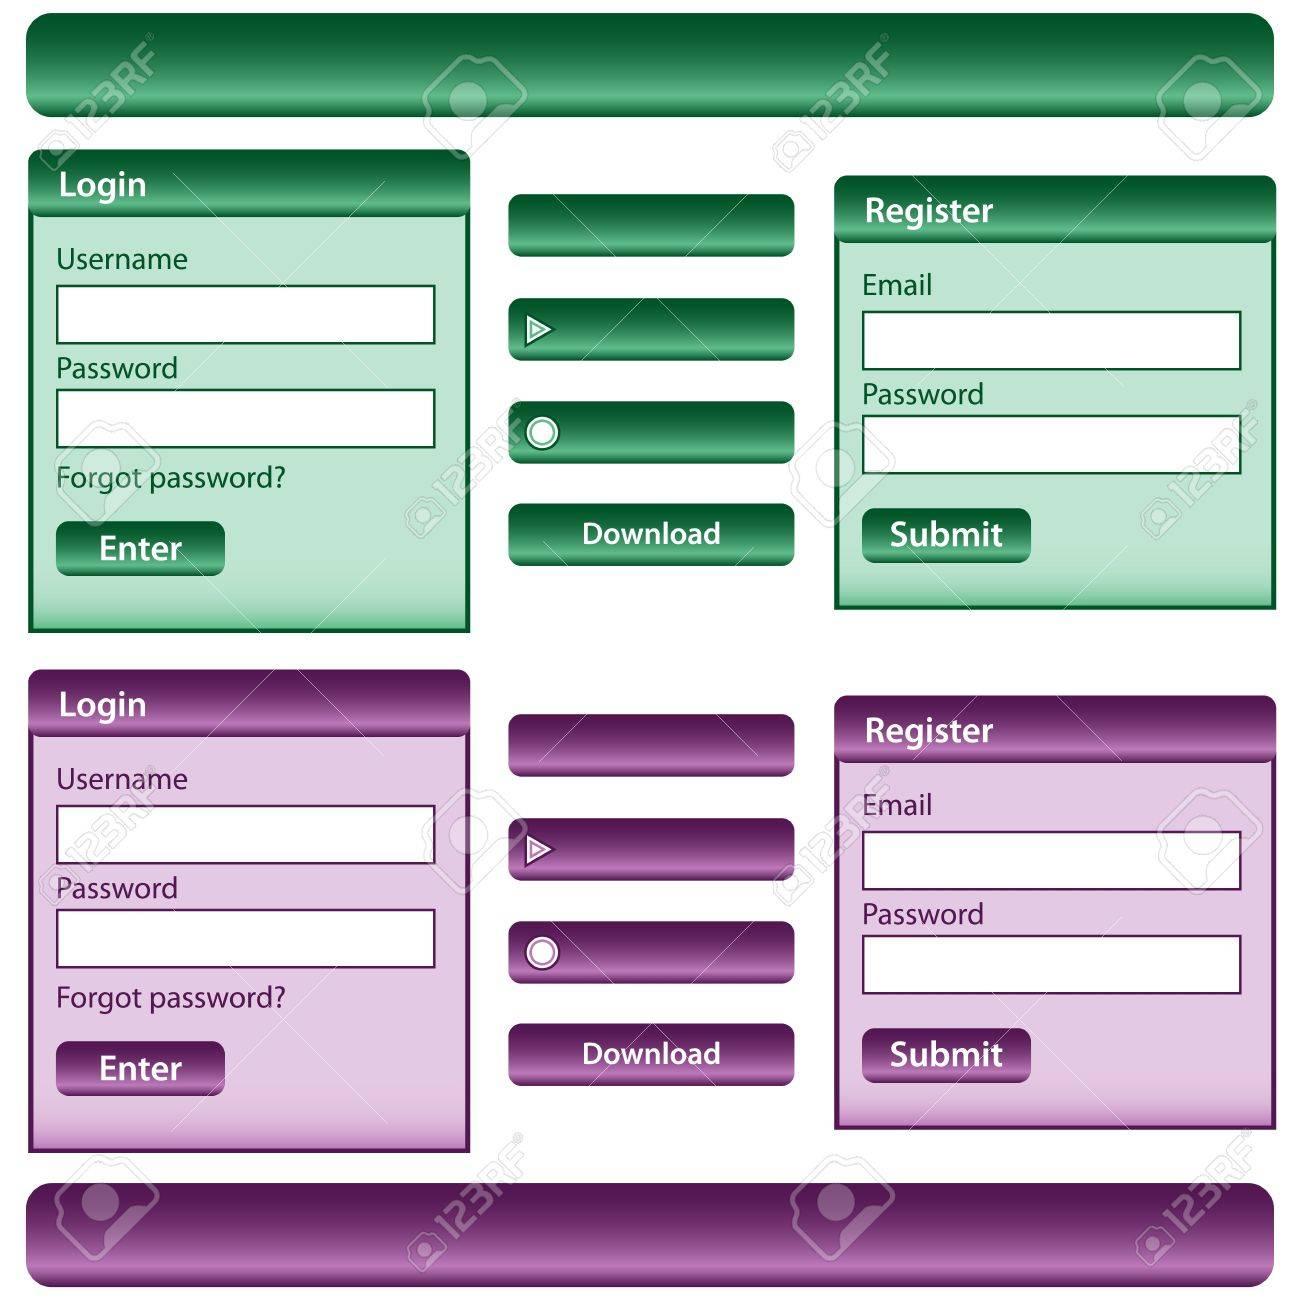 Free website templates menu bars